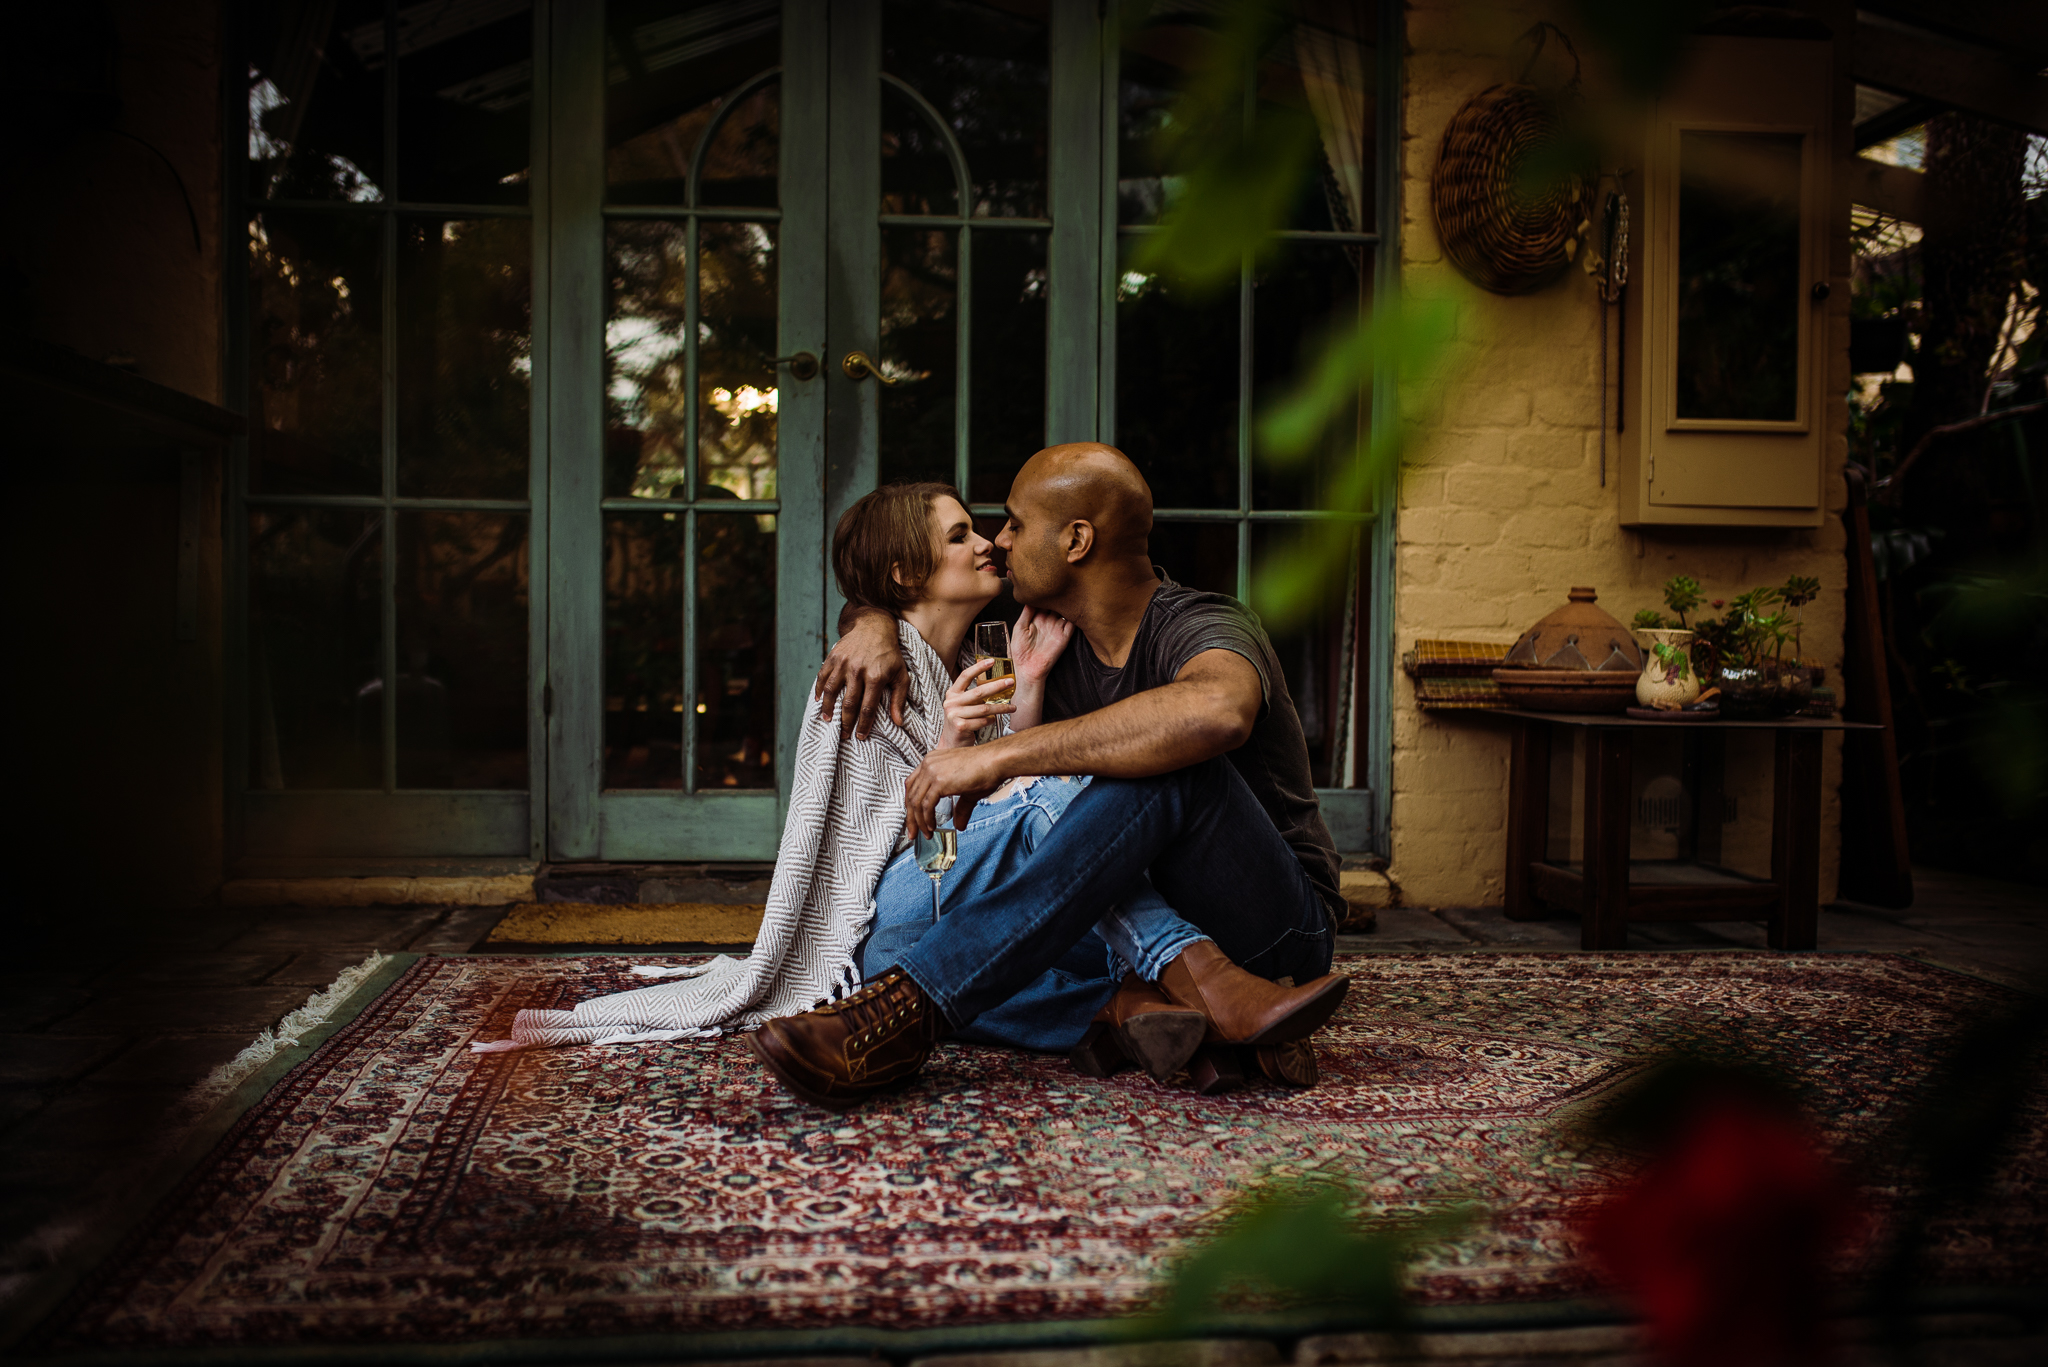 Melbourne engagement shoot. Intimate engagement shoot